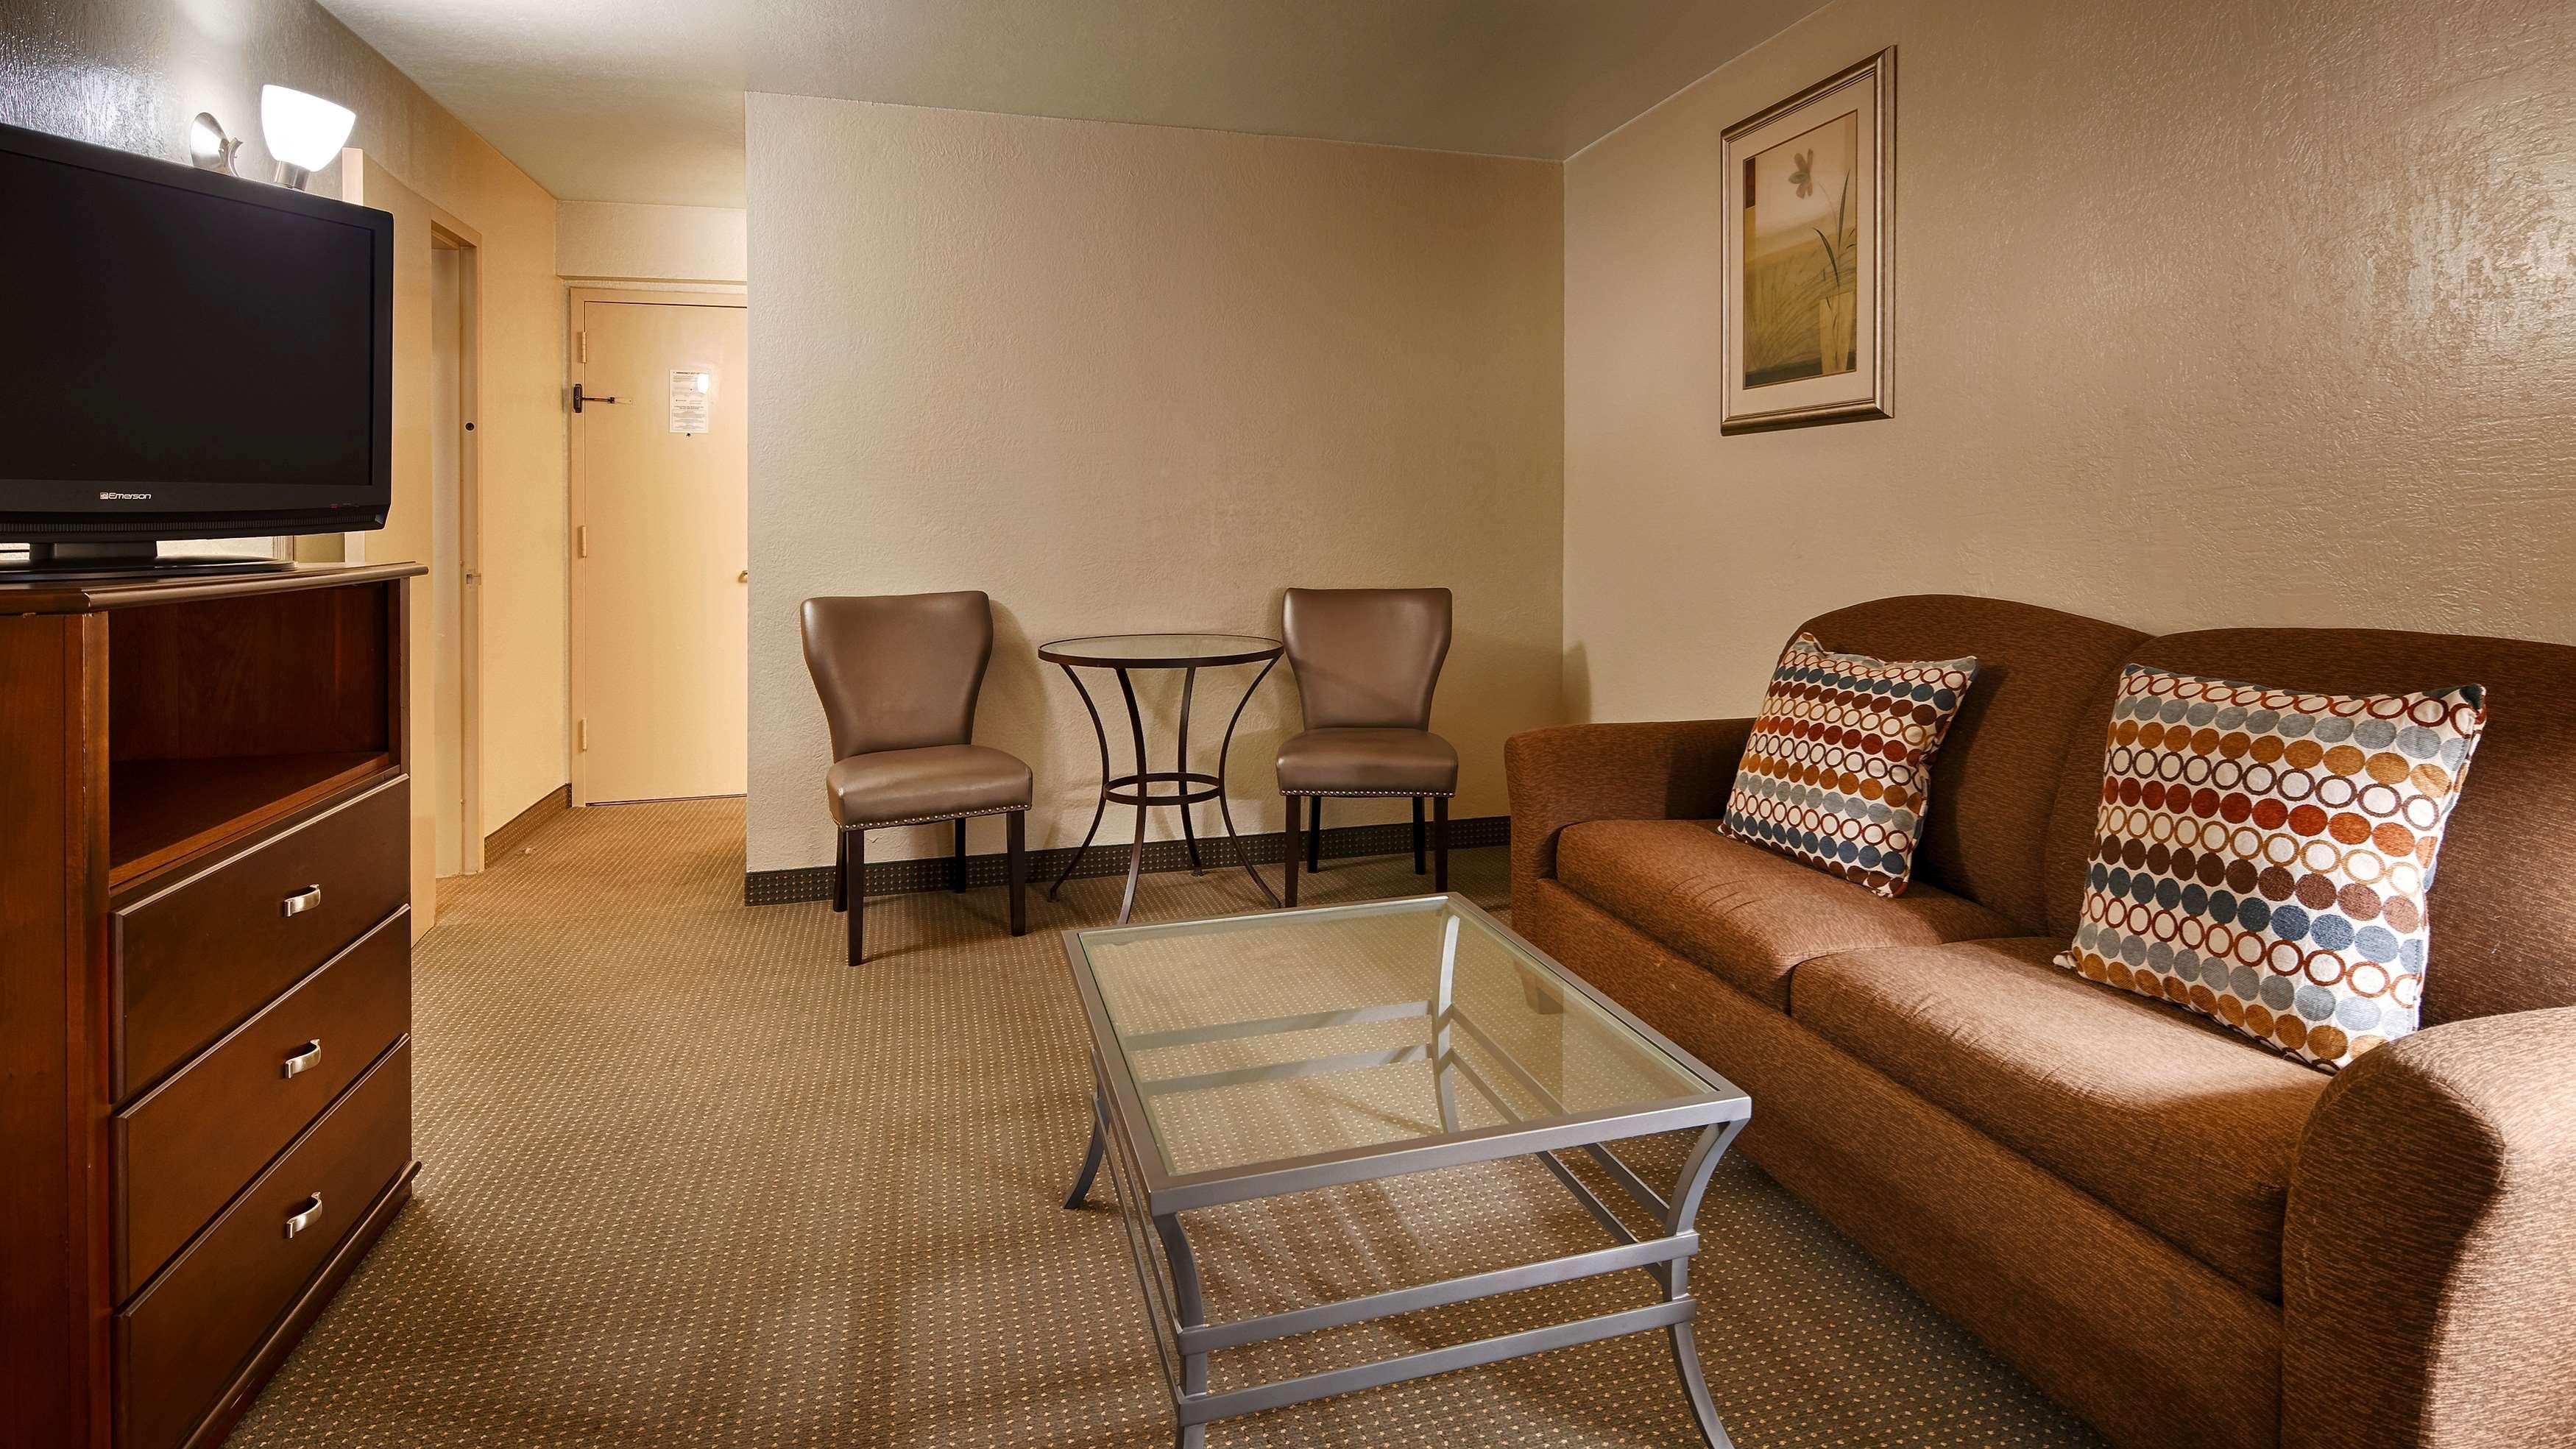 Best Western Plus Lawton Hotel & Convention Center image 16